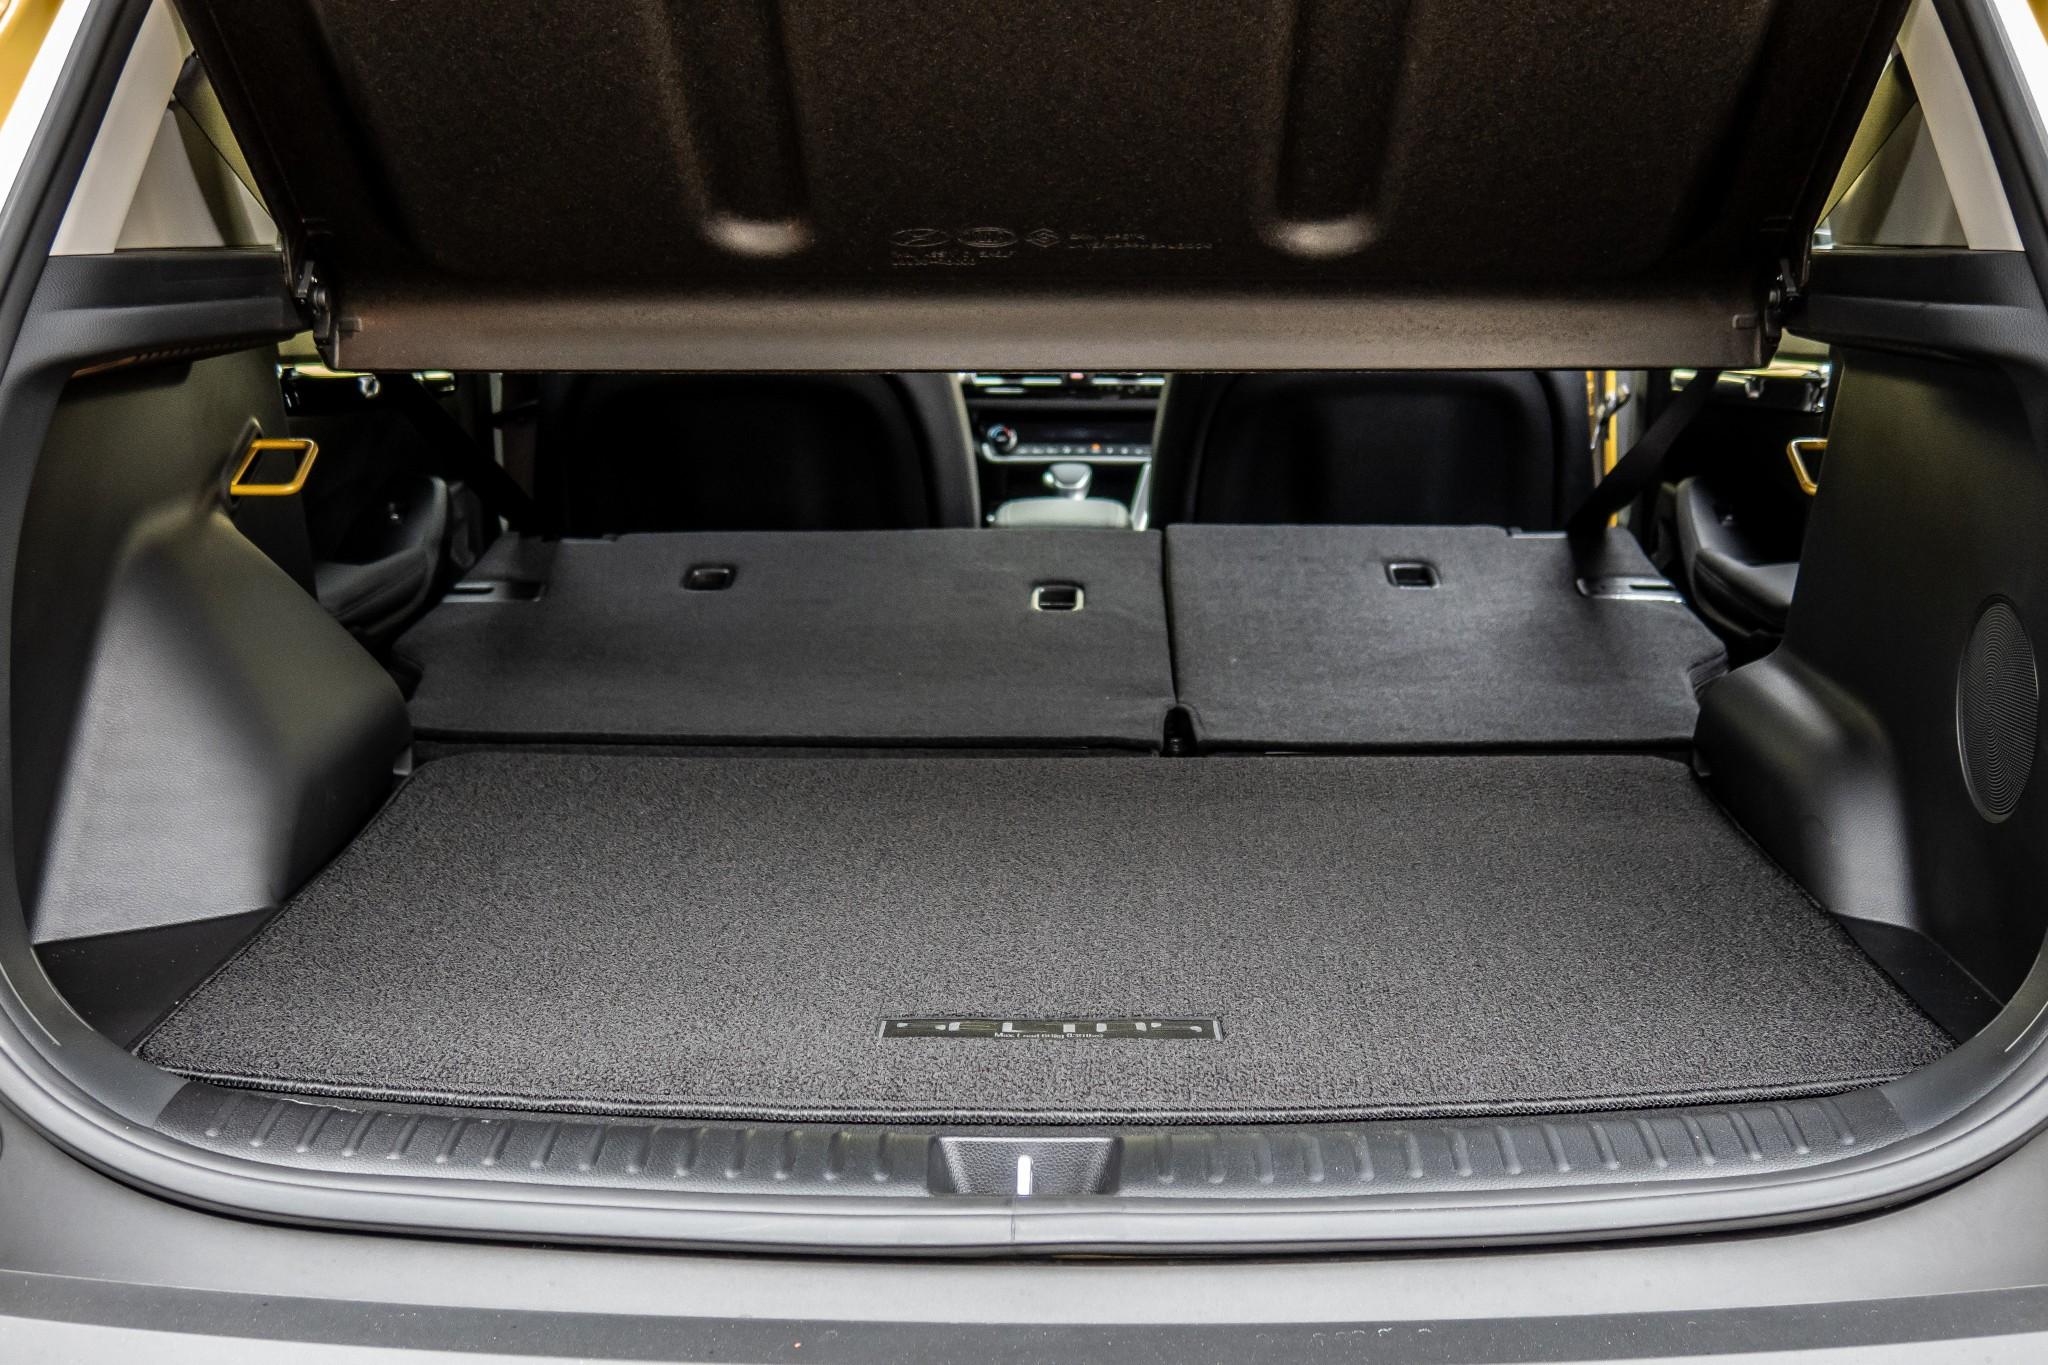 kia-seltos-2021-39-folding-seats--interior--rear--trunk.jpg